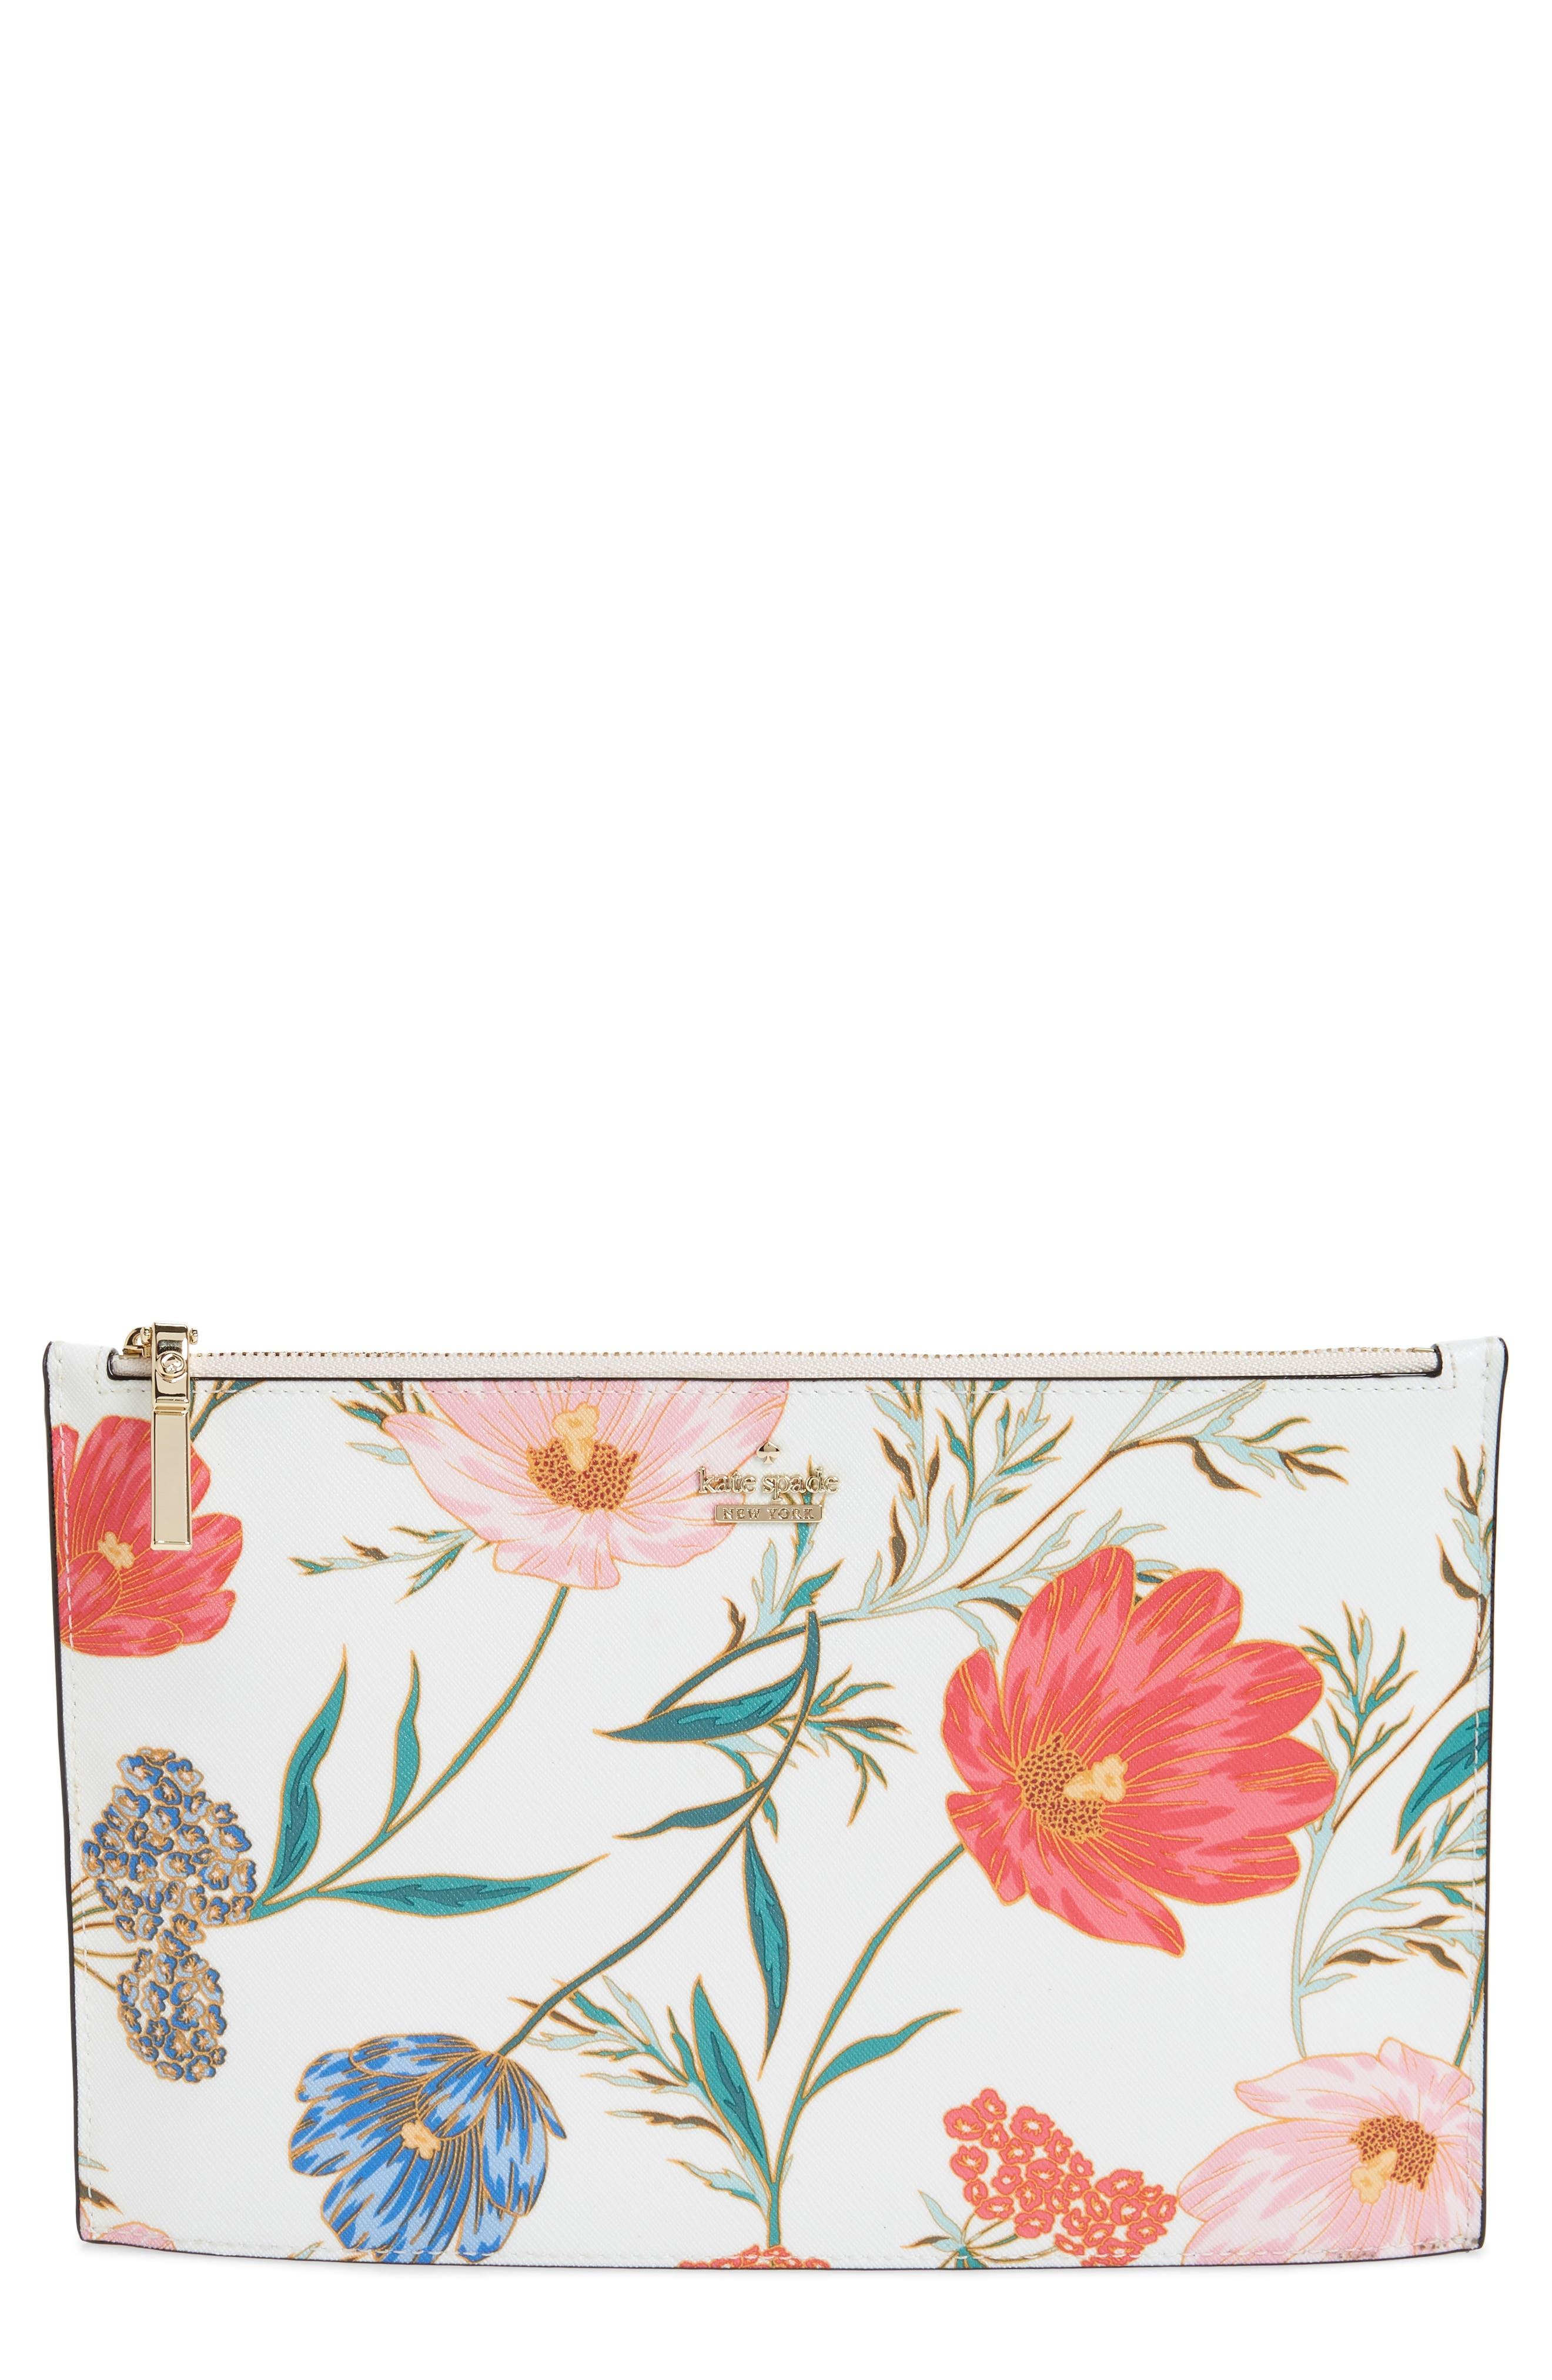 cameron street – blossom lilia leather clutch,                         Main,                         color, Cream